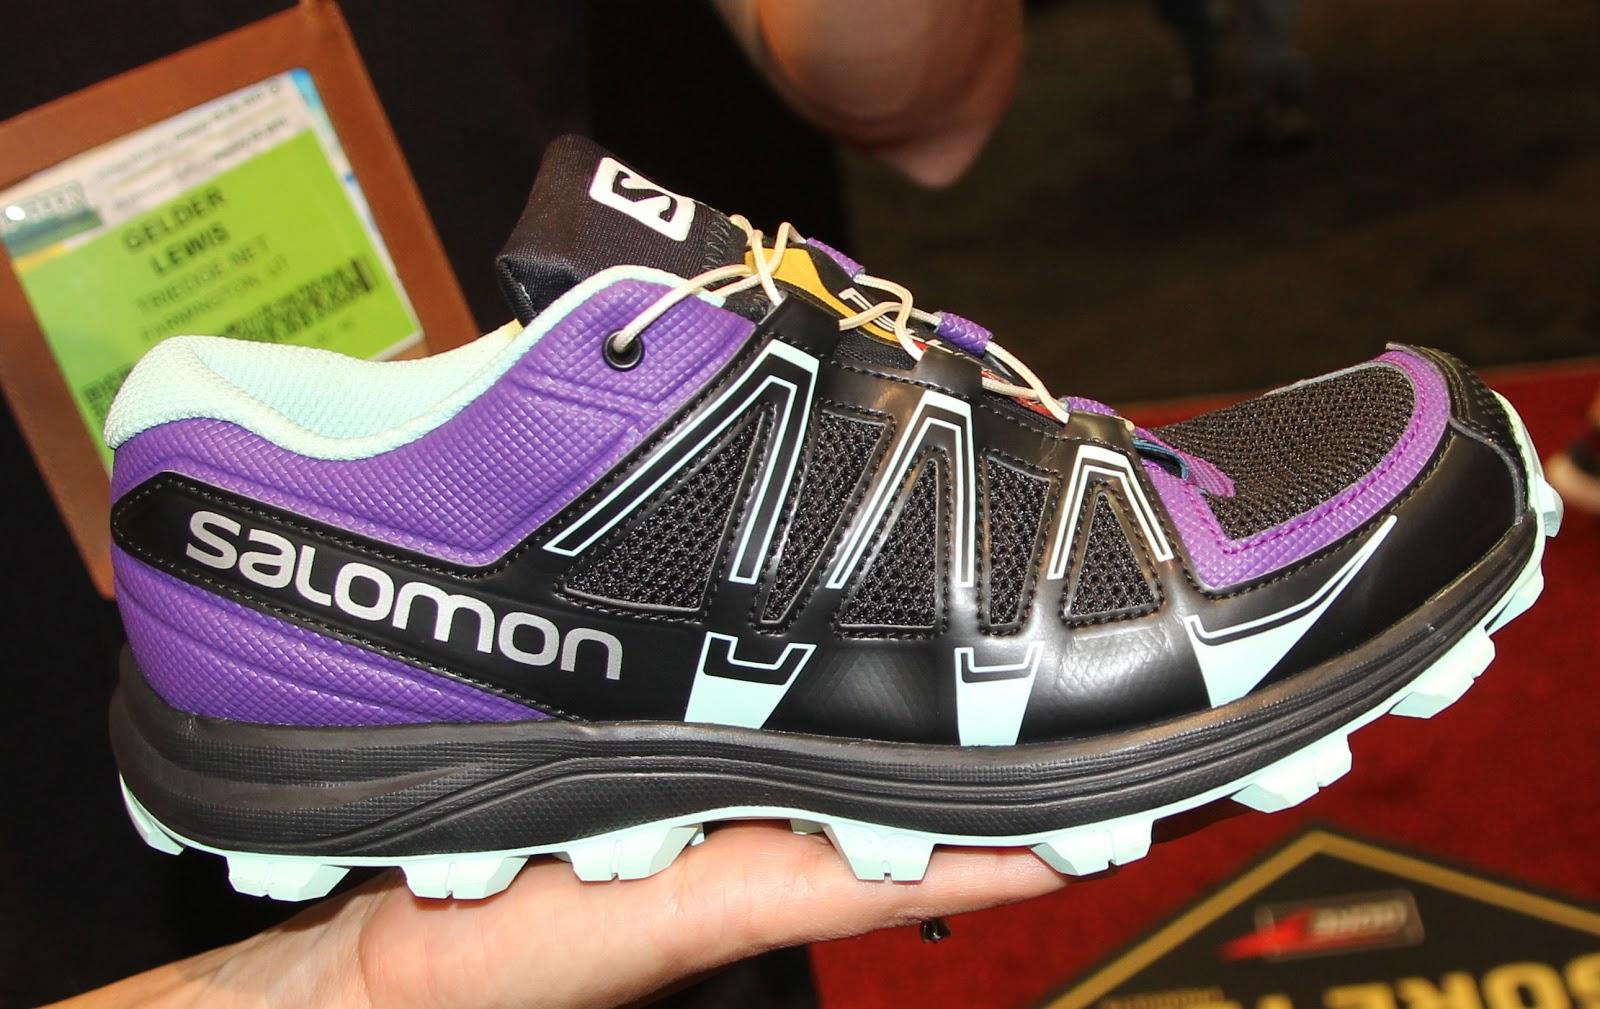 Salomon Footwear FallWinter 20132014 HikingTrail Running